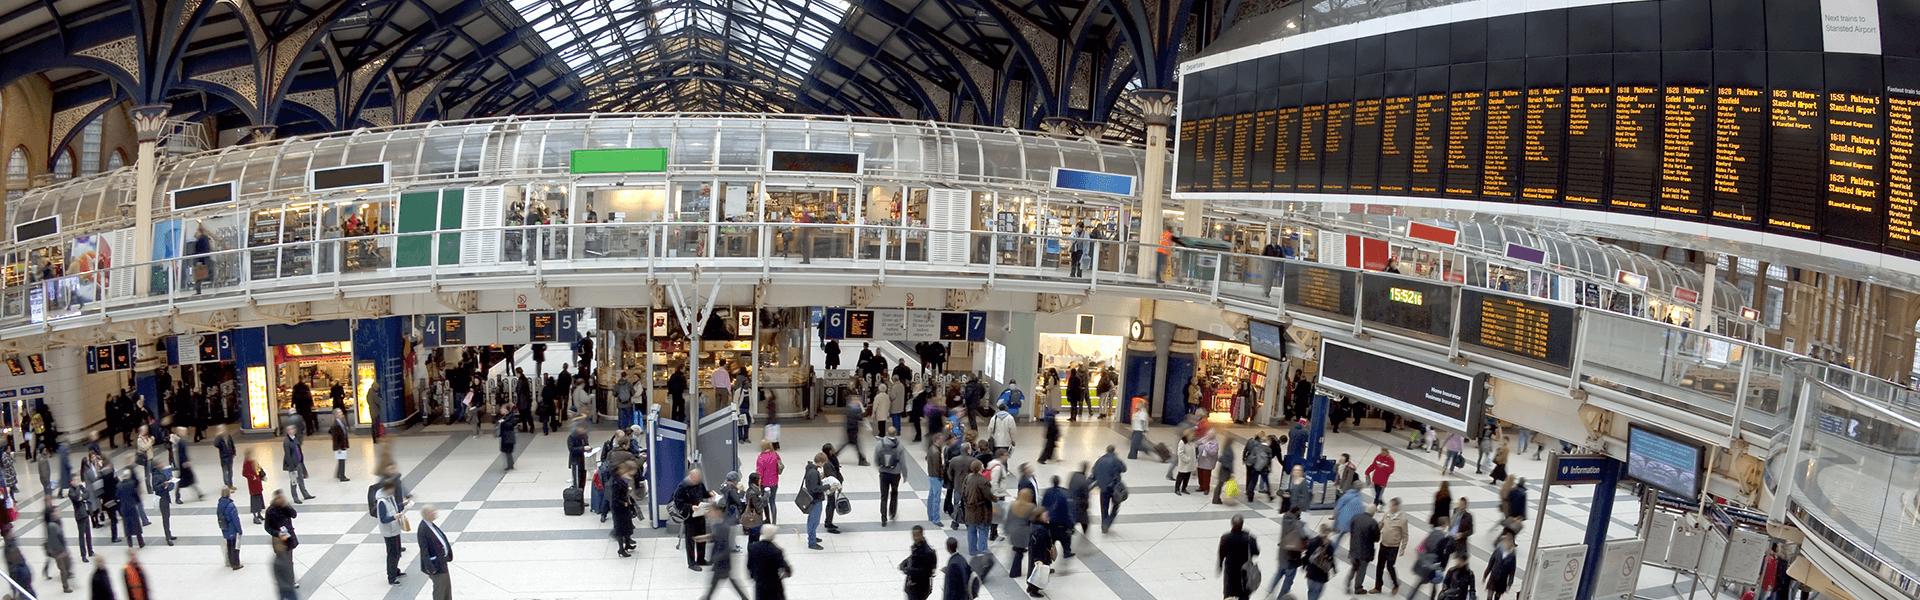 Liverpool Street Station fisheye